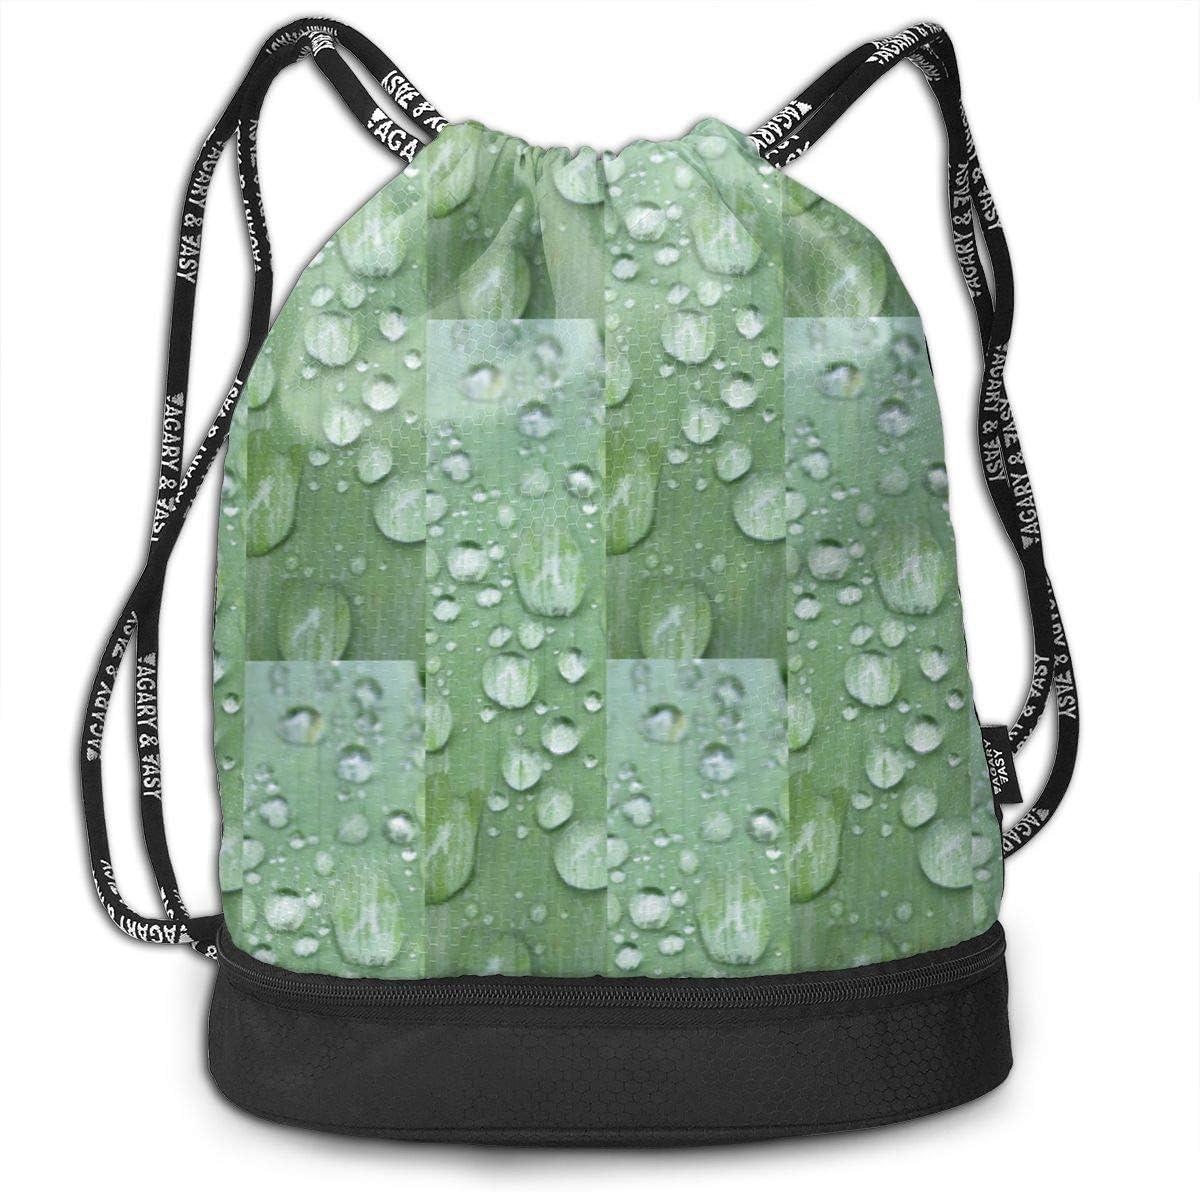 Raindrops Keep Fallinon Leaf Drawstring Backpack Sports Athletic Gym Cinch Sack String Storage Bags for Hiking Travel Beach